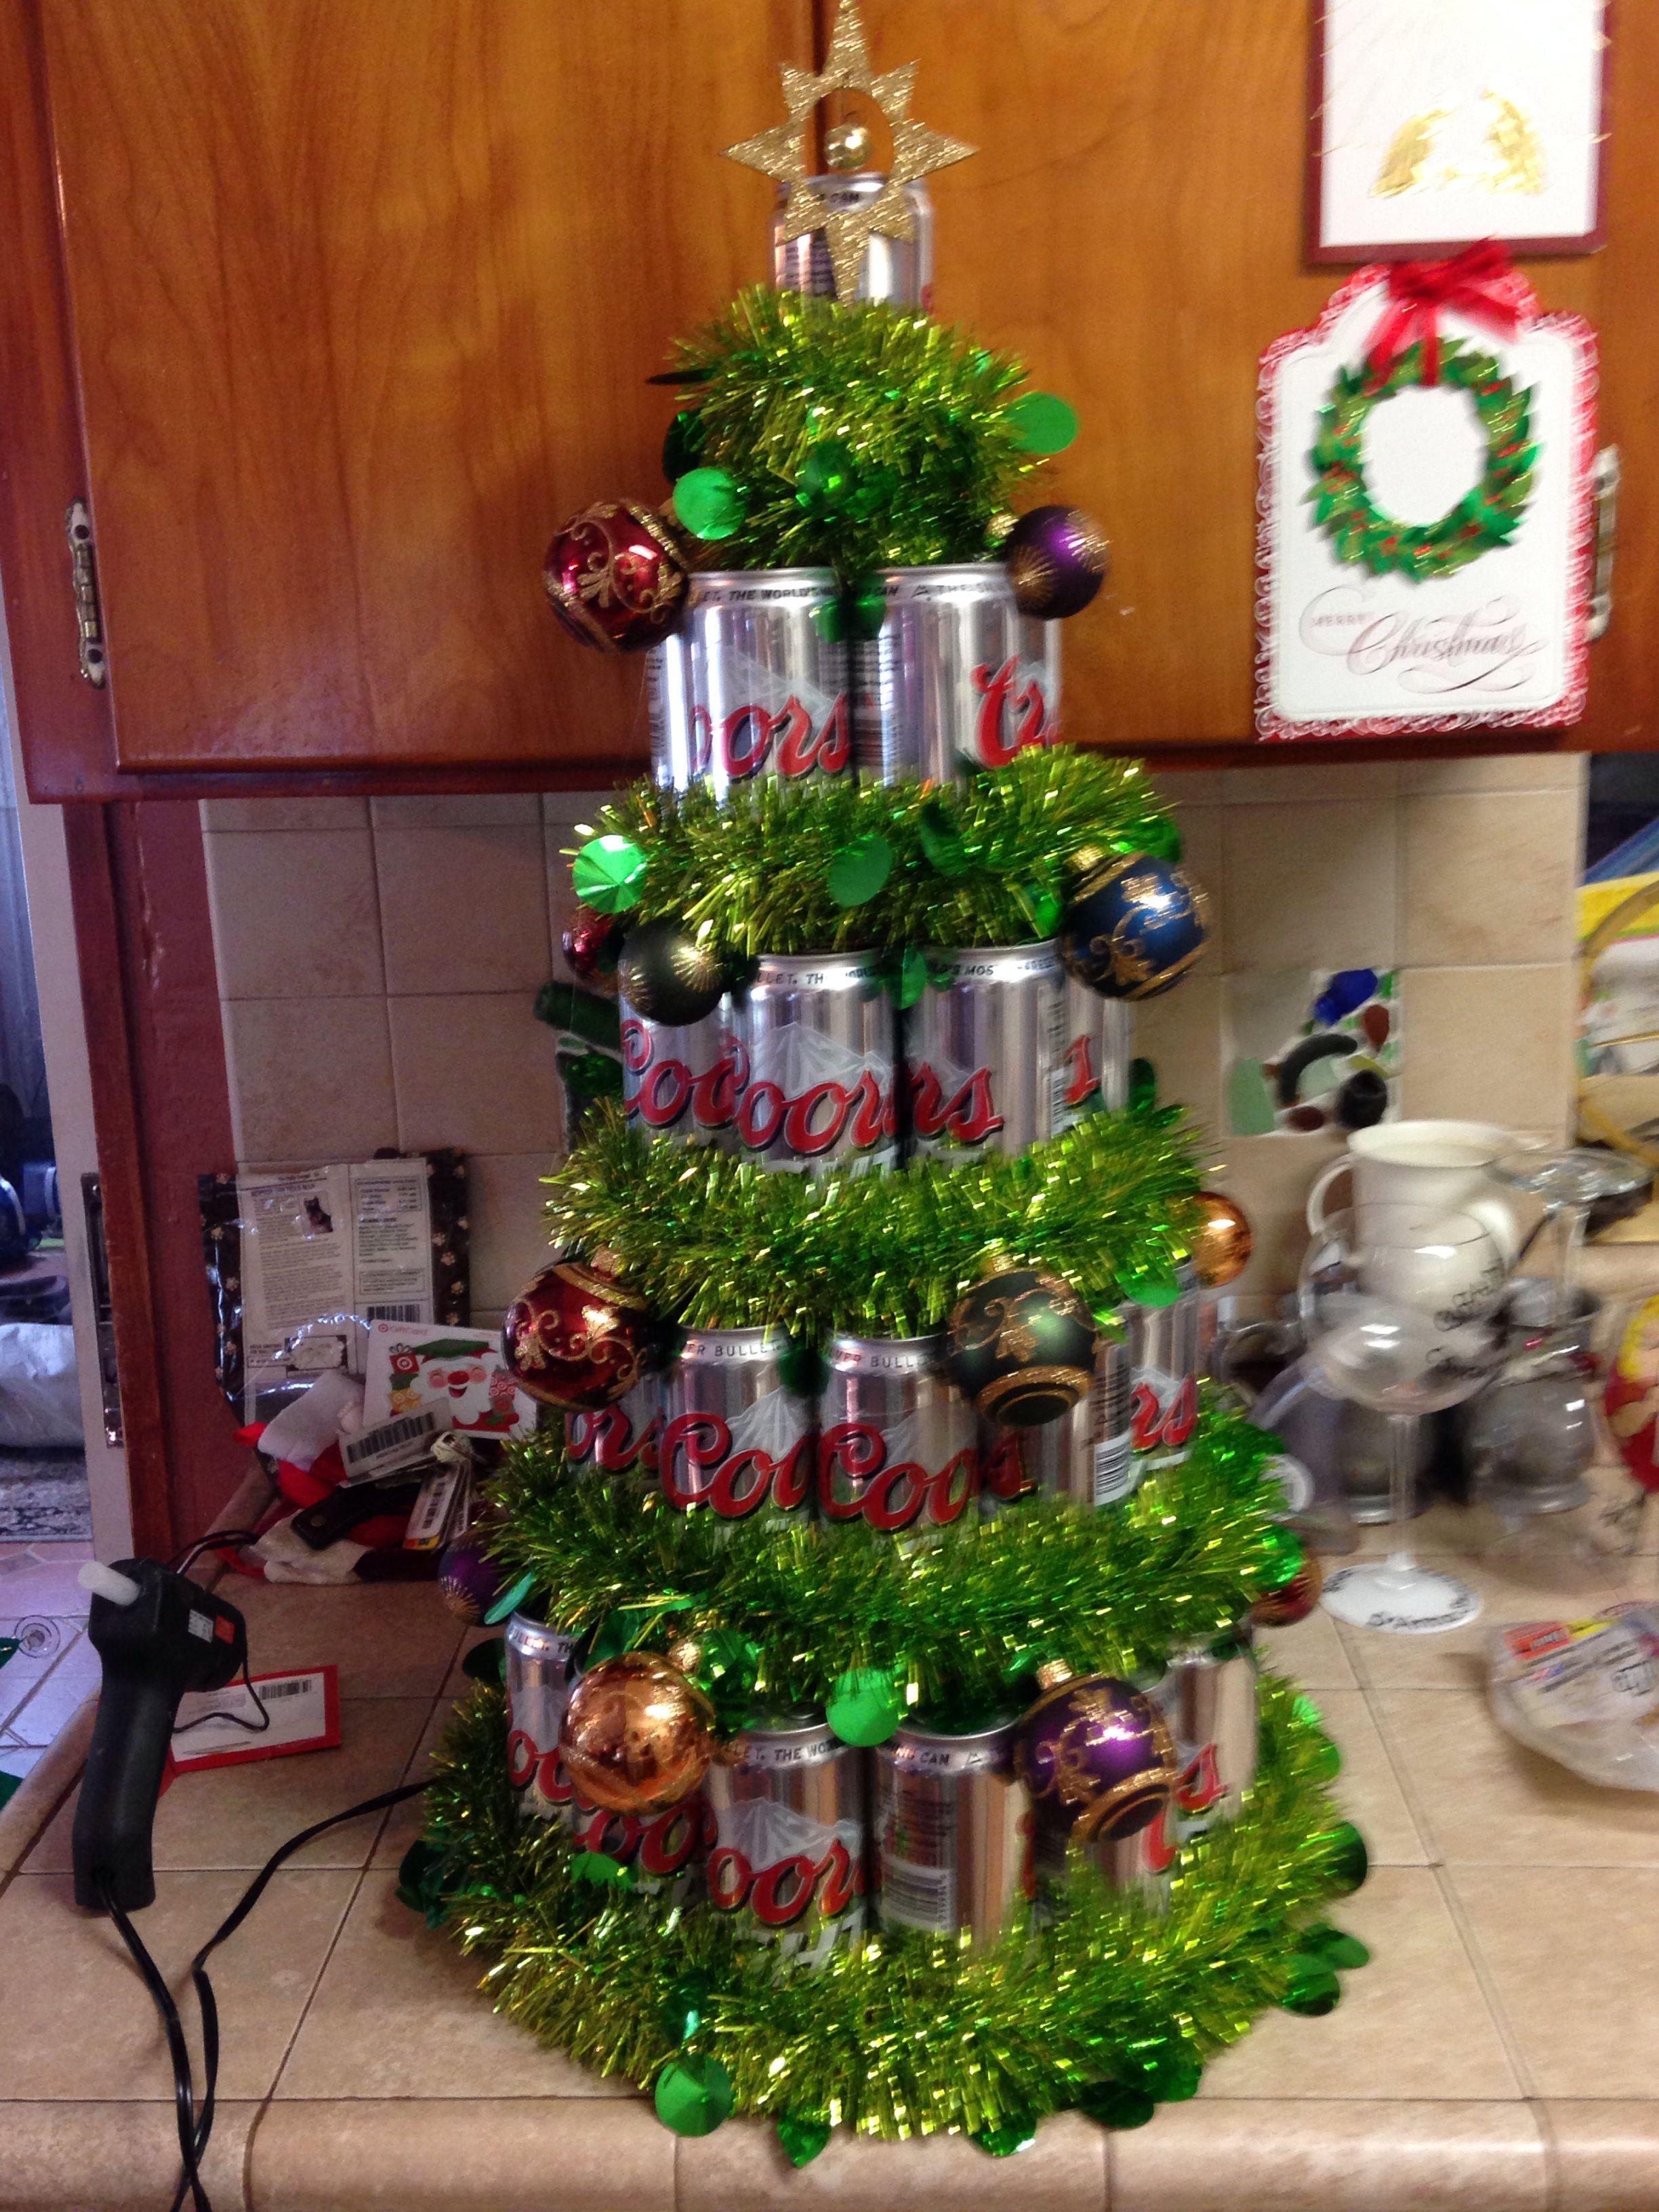 Beer Tree Beer Christmas Gifts Christmas Tree With Gifts Beer Can Christmas Tree